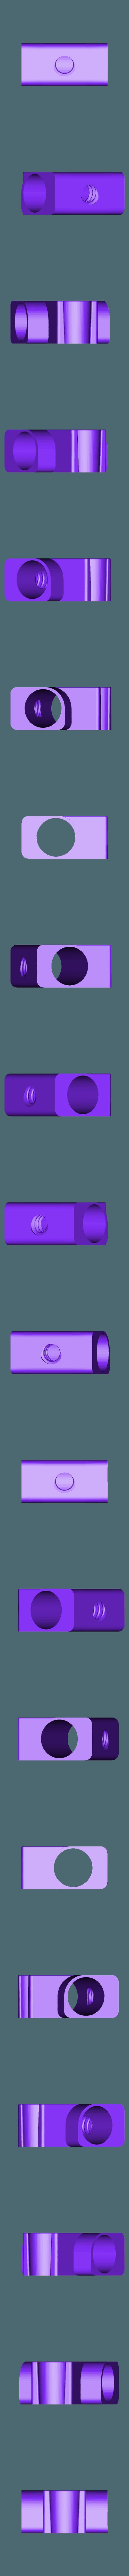 Shower Head Holder Body.stl Download free STL file Shower Head Holder • 3D printing template, HomeLite